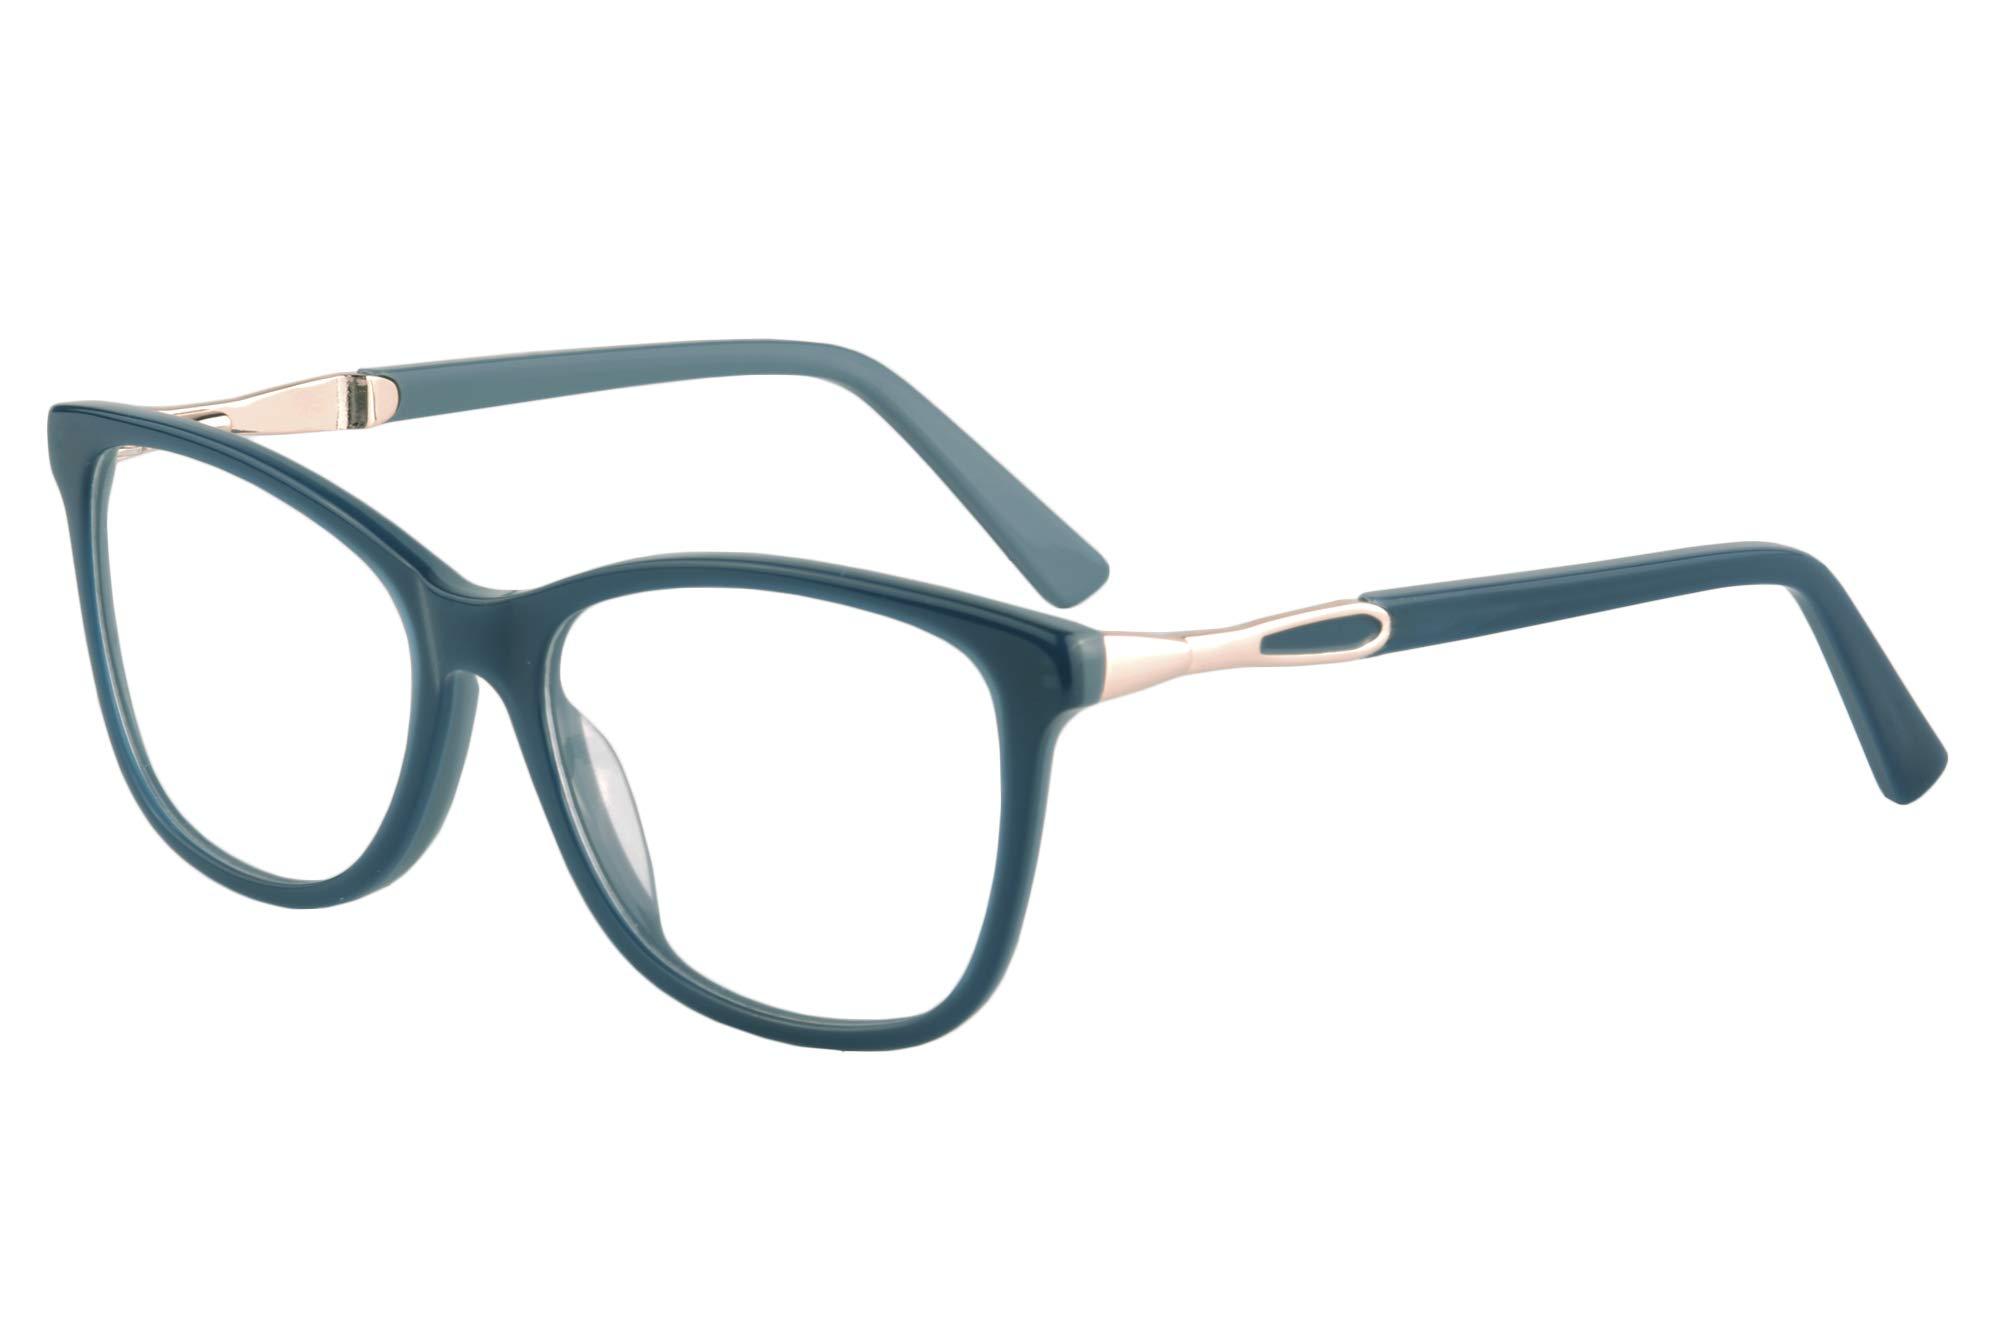 SHINU Acetate Cateye Frame Progressive Multifocus Anti Blue Light No Headach Reading Glasses-RD142(blue, anti-blue up 0 down 2.00)